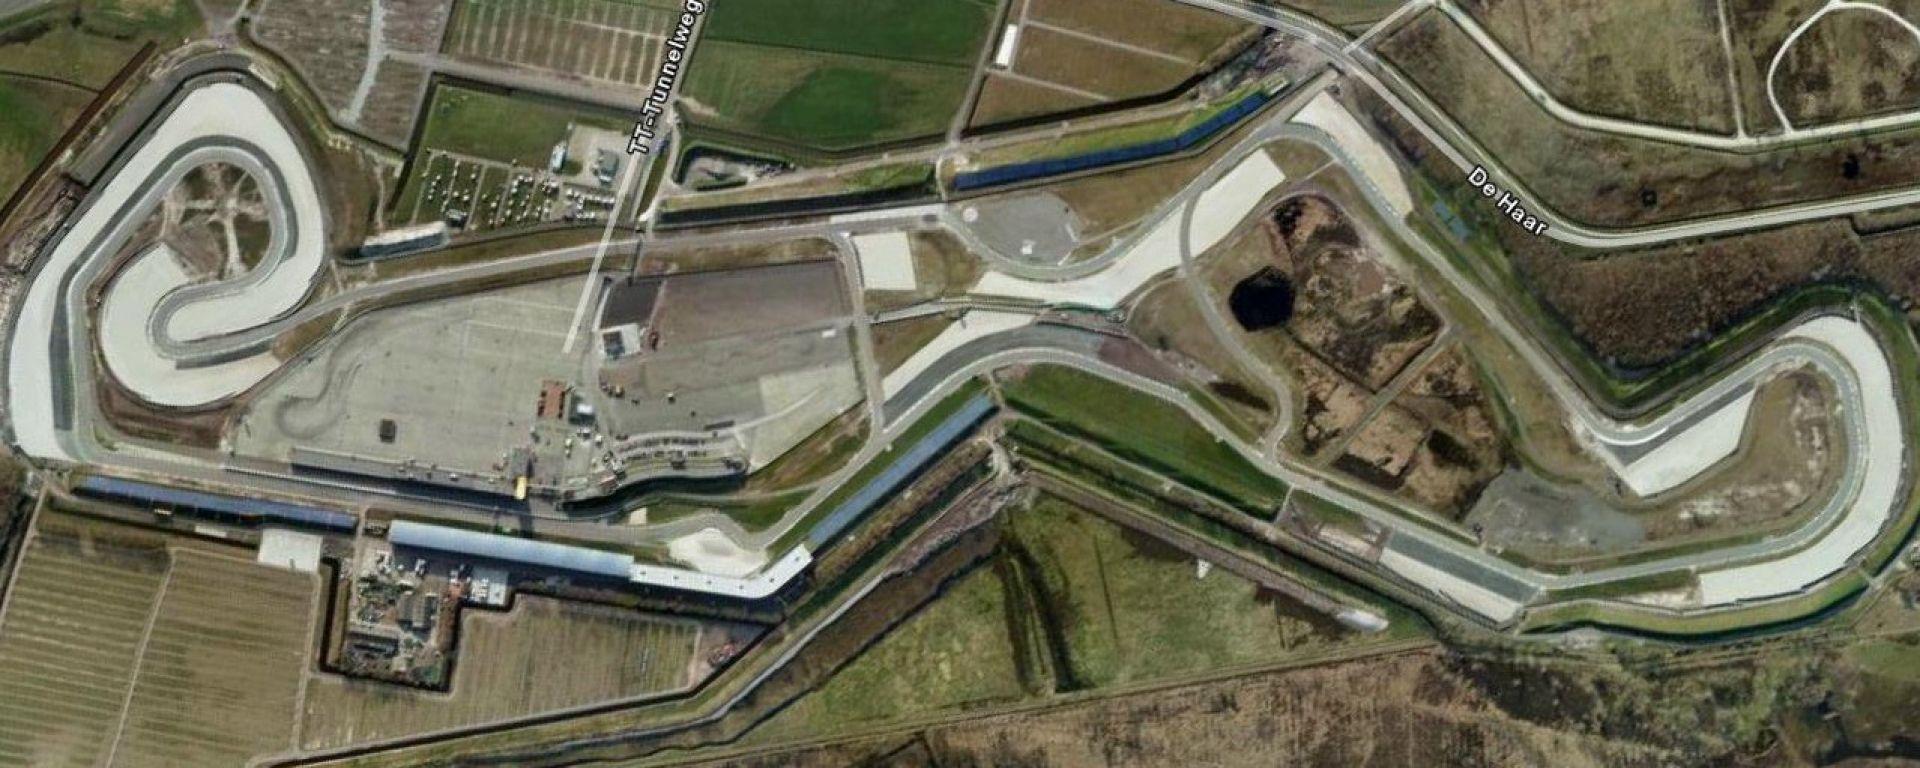 MotoGP Assen Olanda: Prove libere, qualifiche, risultati gara